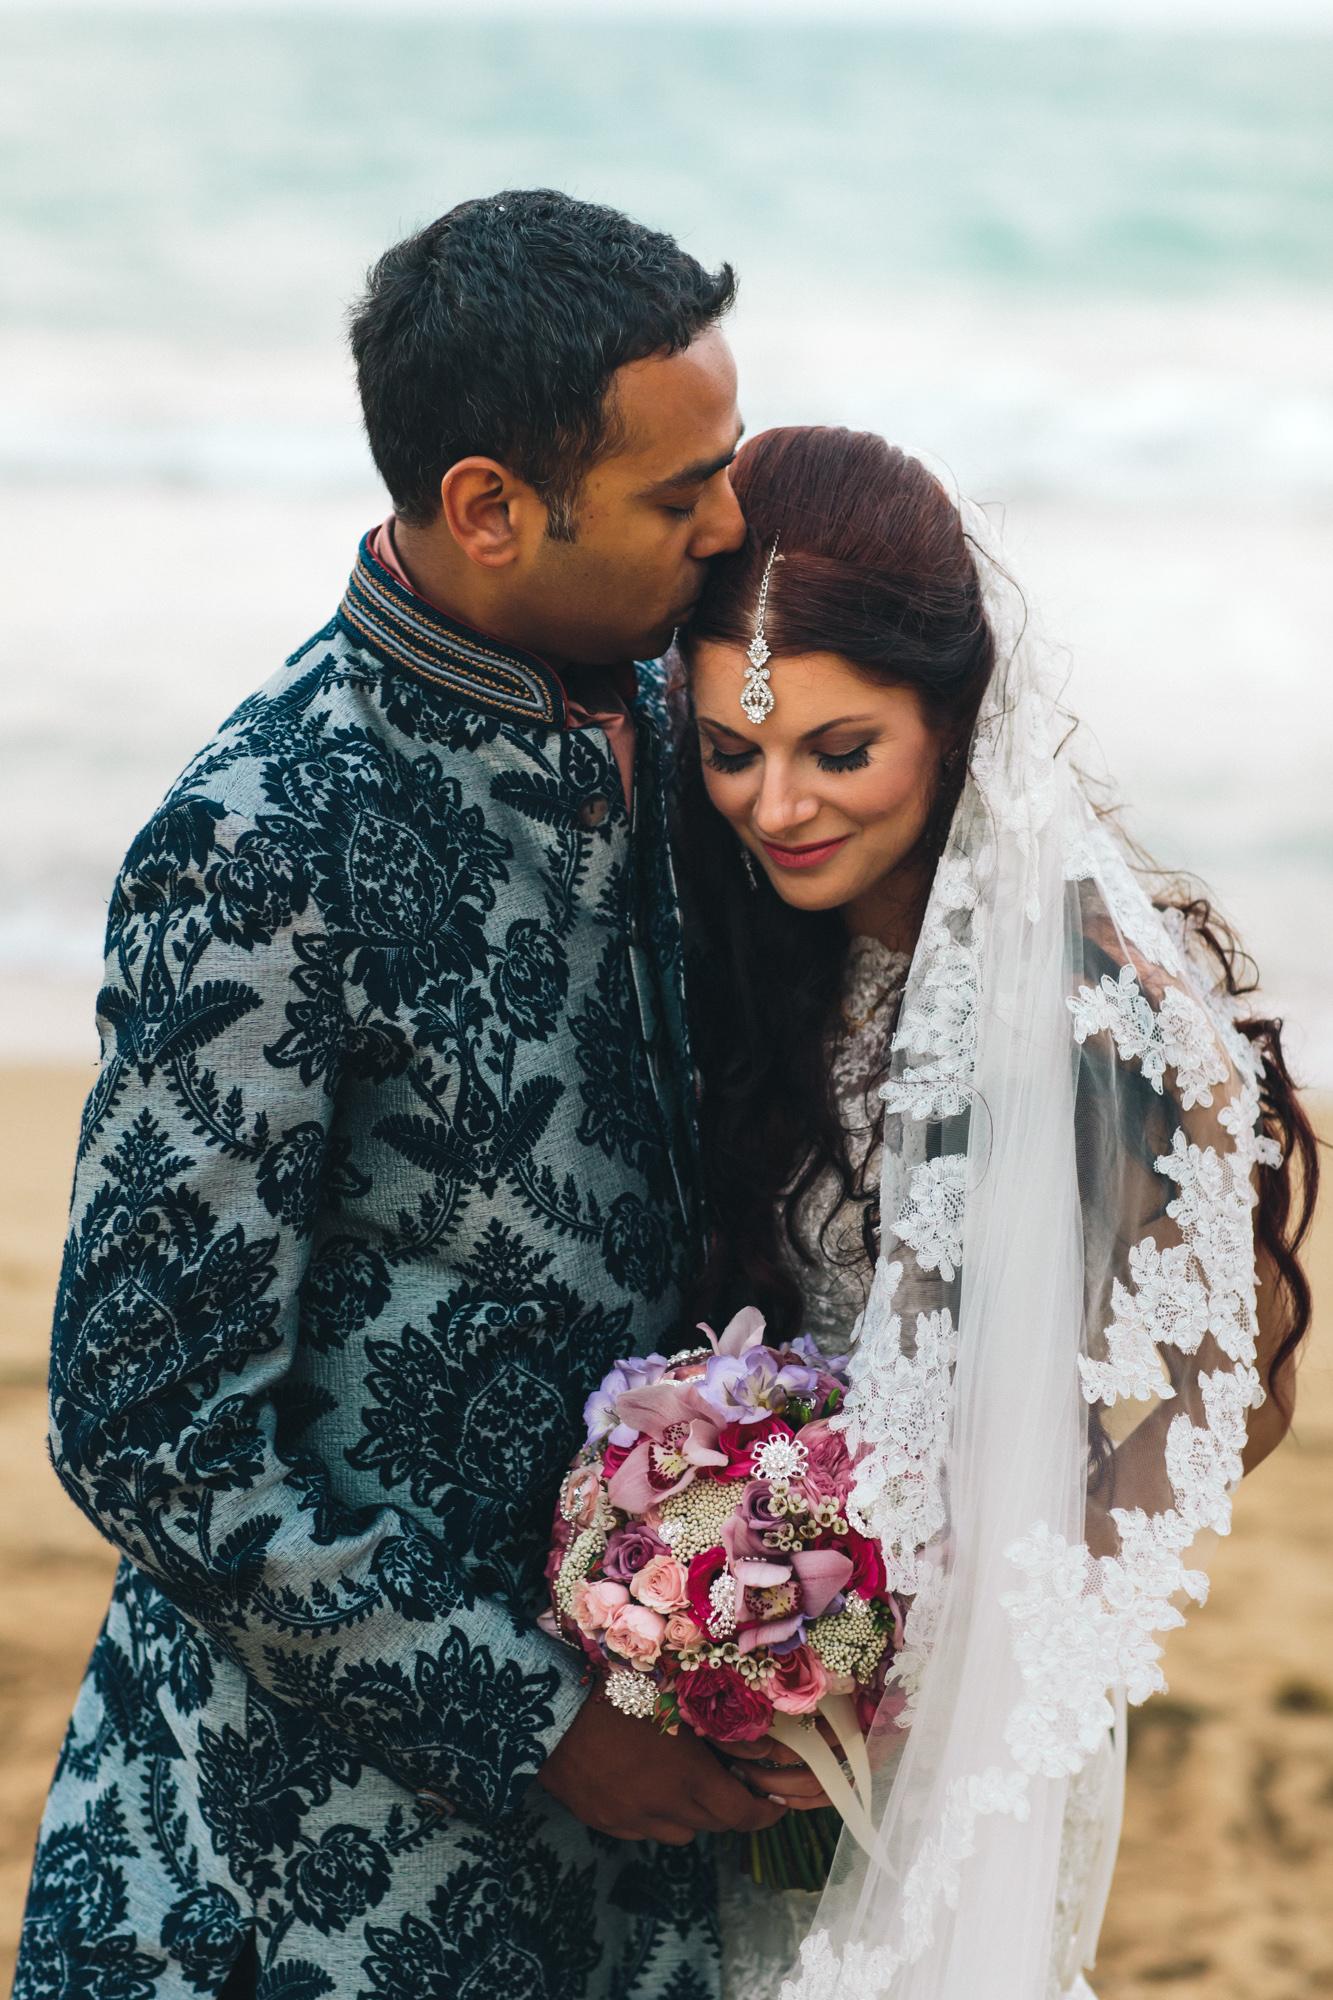 Puerto Rico Wedding Photography Destination Photographer Boris Zaretsky San Juan PR Casino Antiguo La Concha _B2C7388.jpg